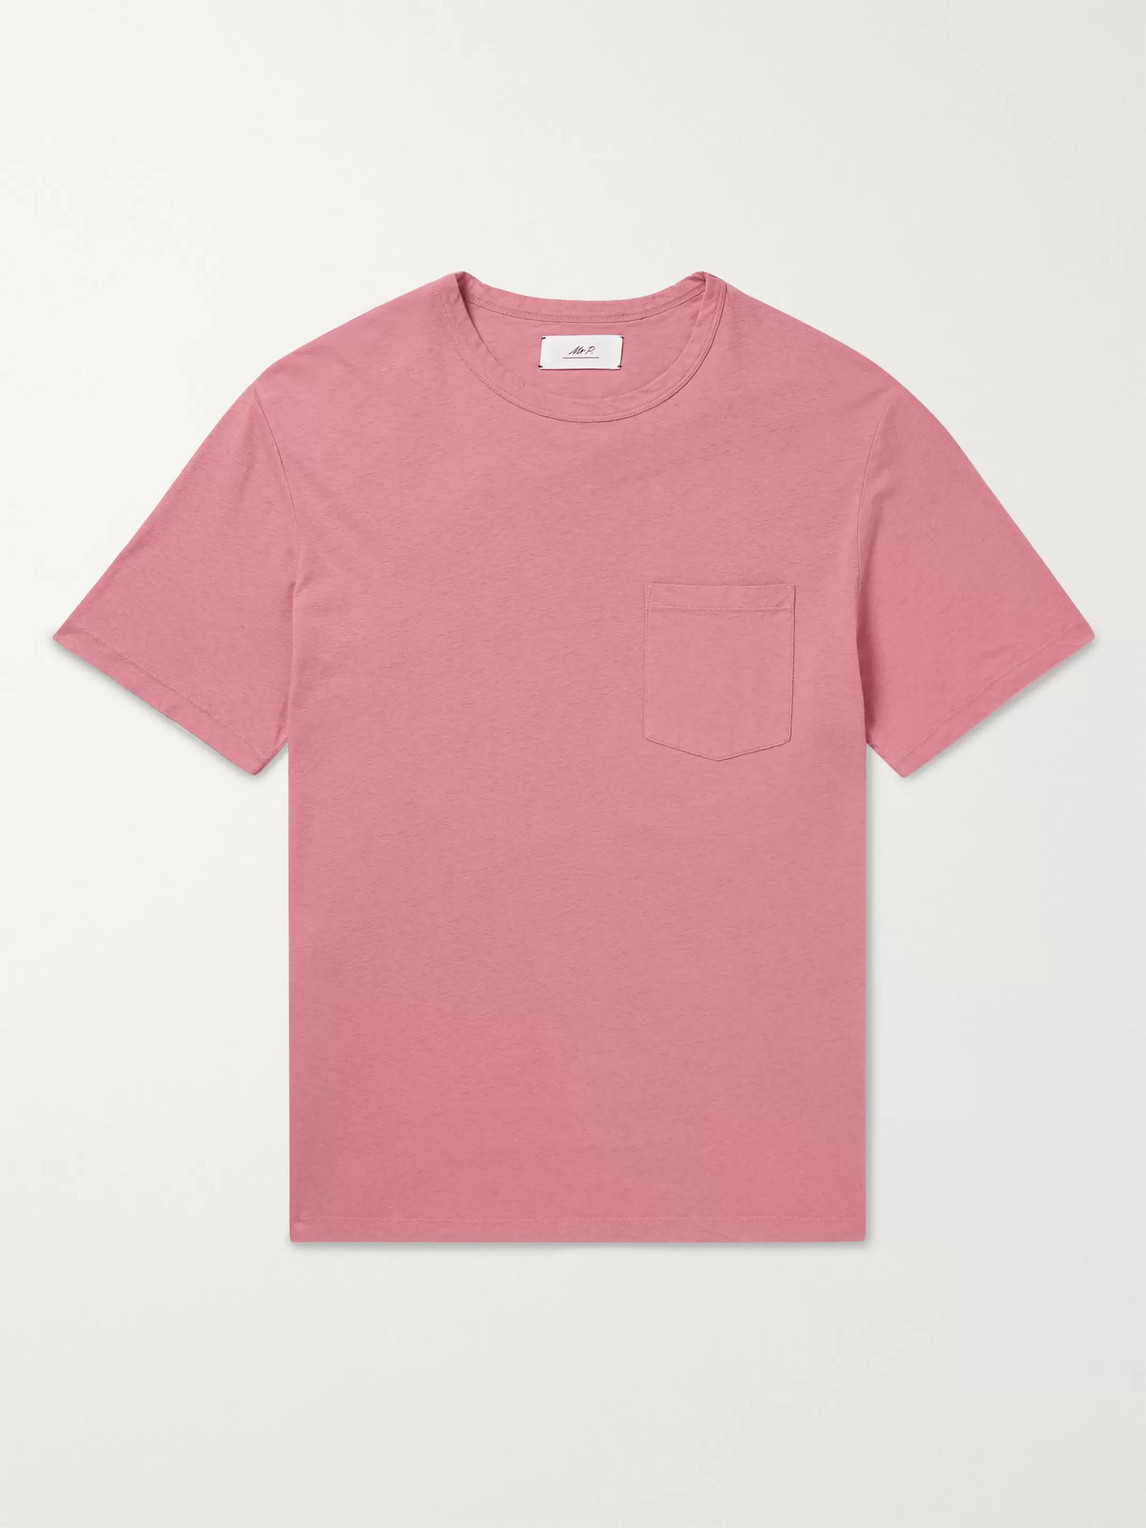 mr p. - cotton and linen-blend t-shirt - men - pink